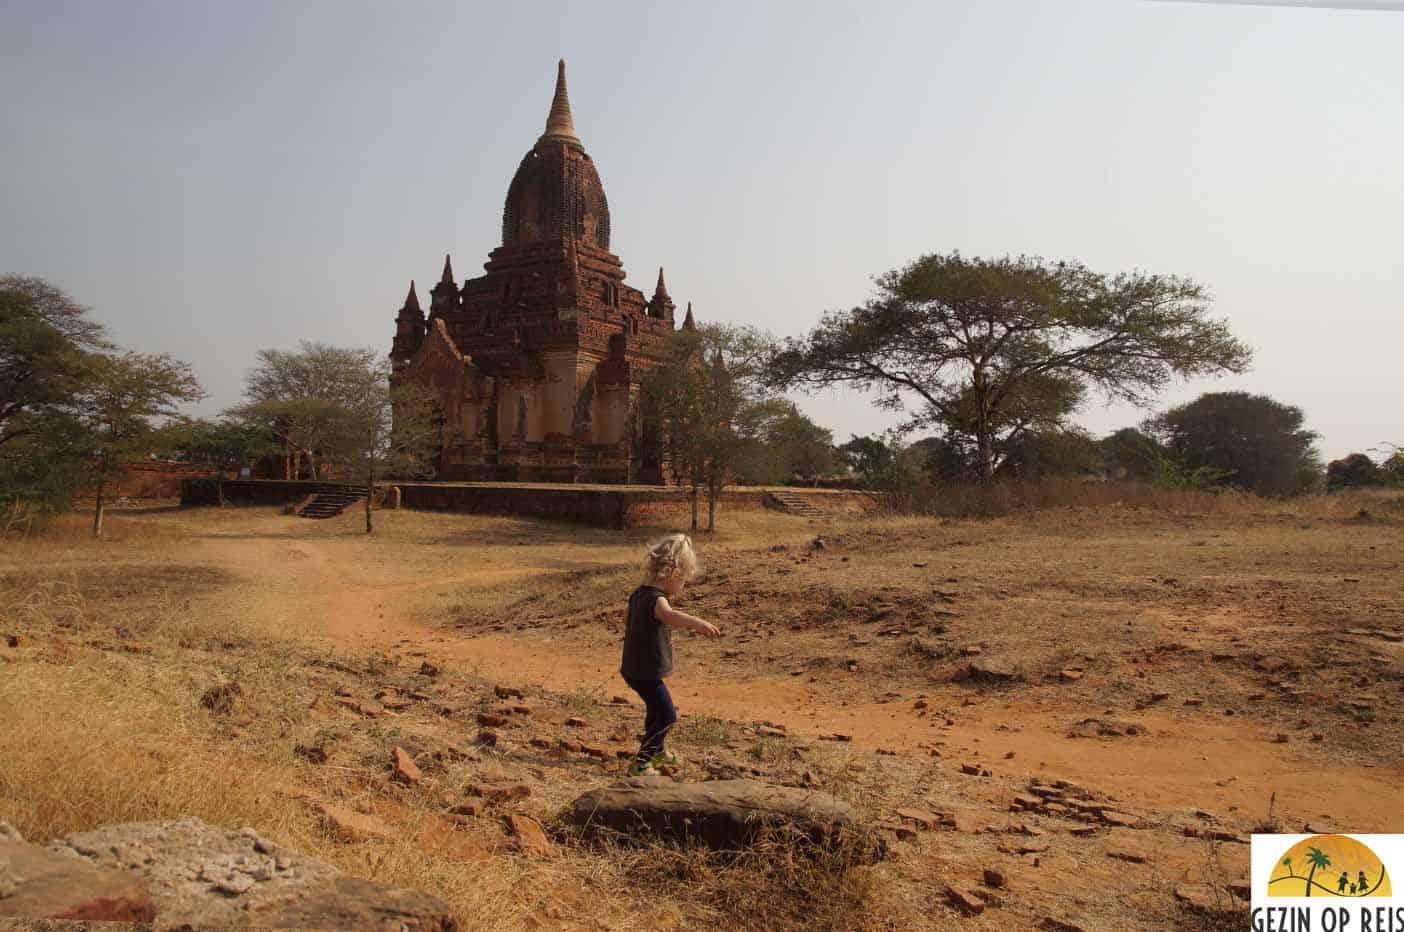 Nandammannya Paya